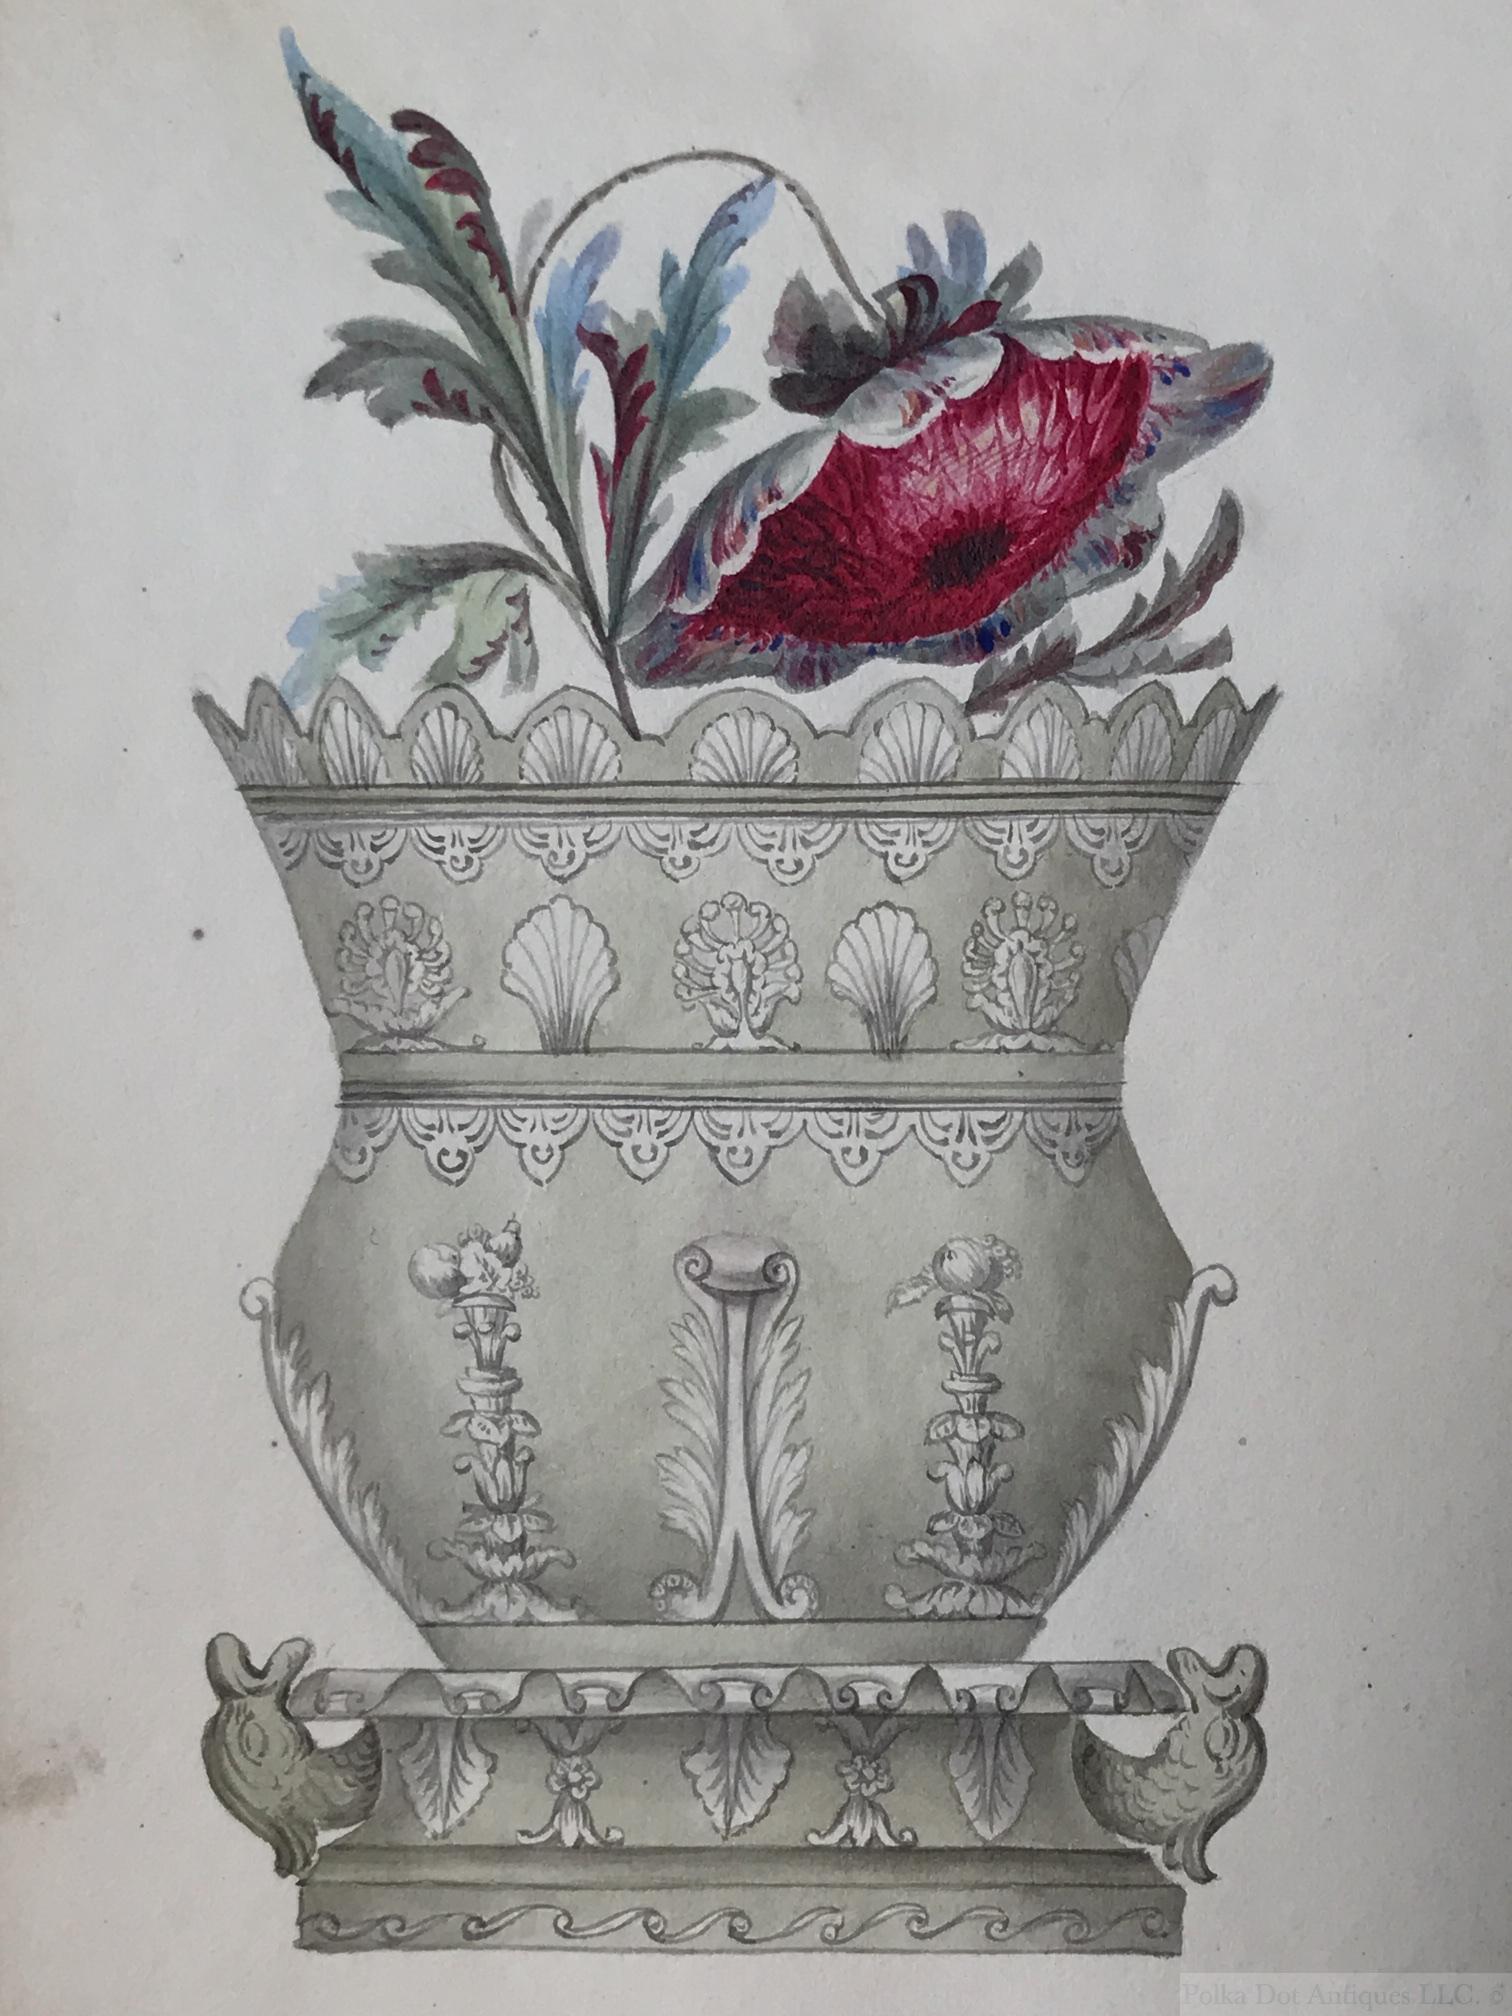 Machin & Potts, Waterloo China Works. Burslem, Shape Book, 1830s, comprising 52 designs.